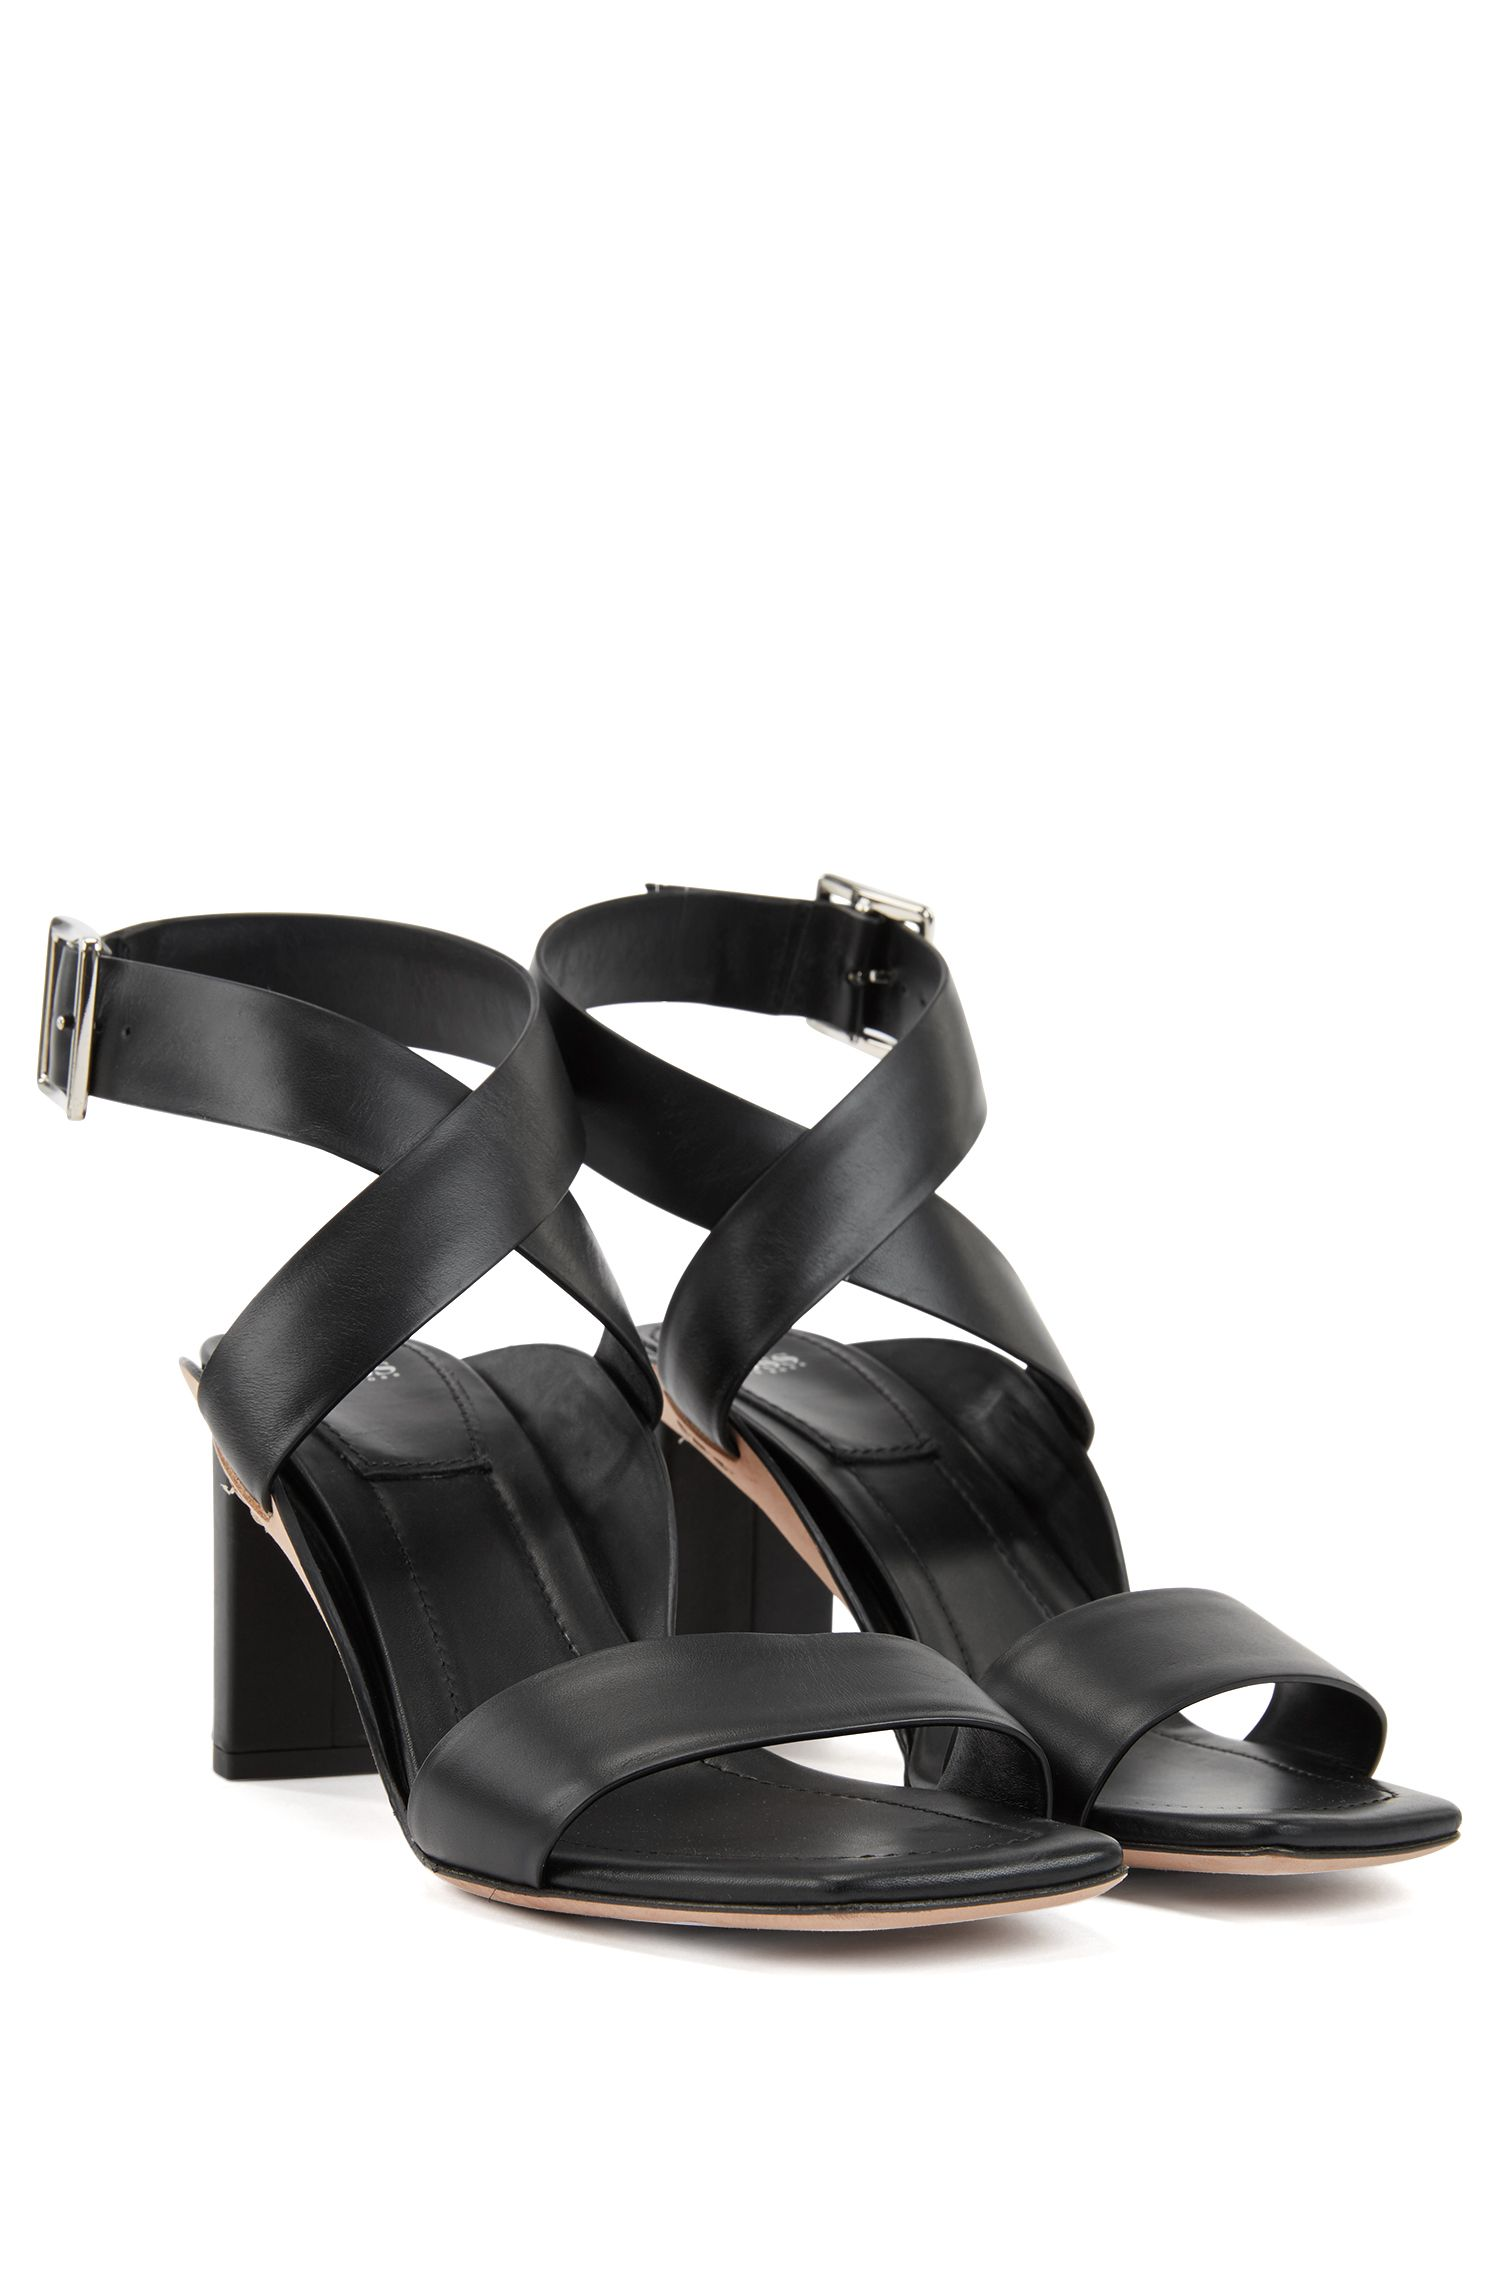 Block-heel leather sandals with wraparound straps, Black